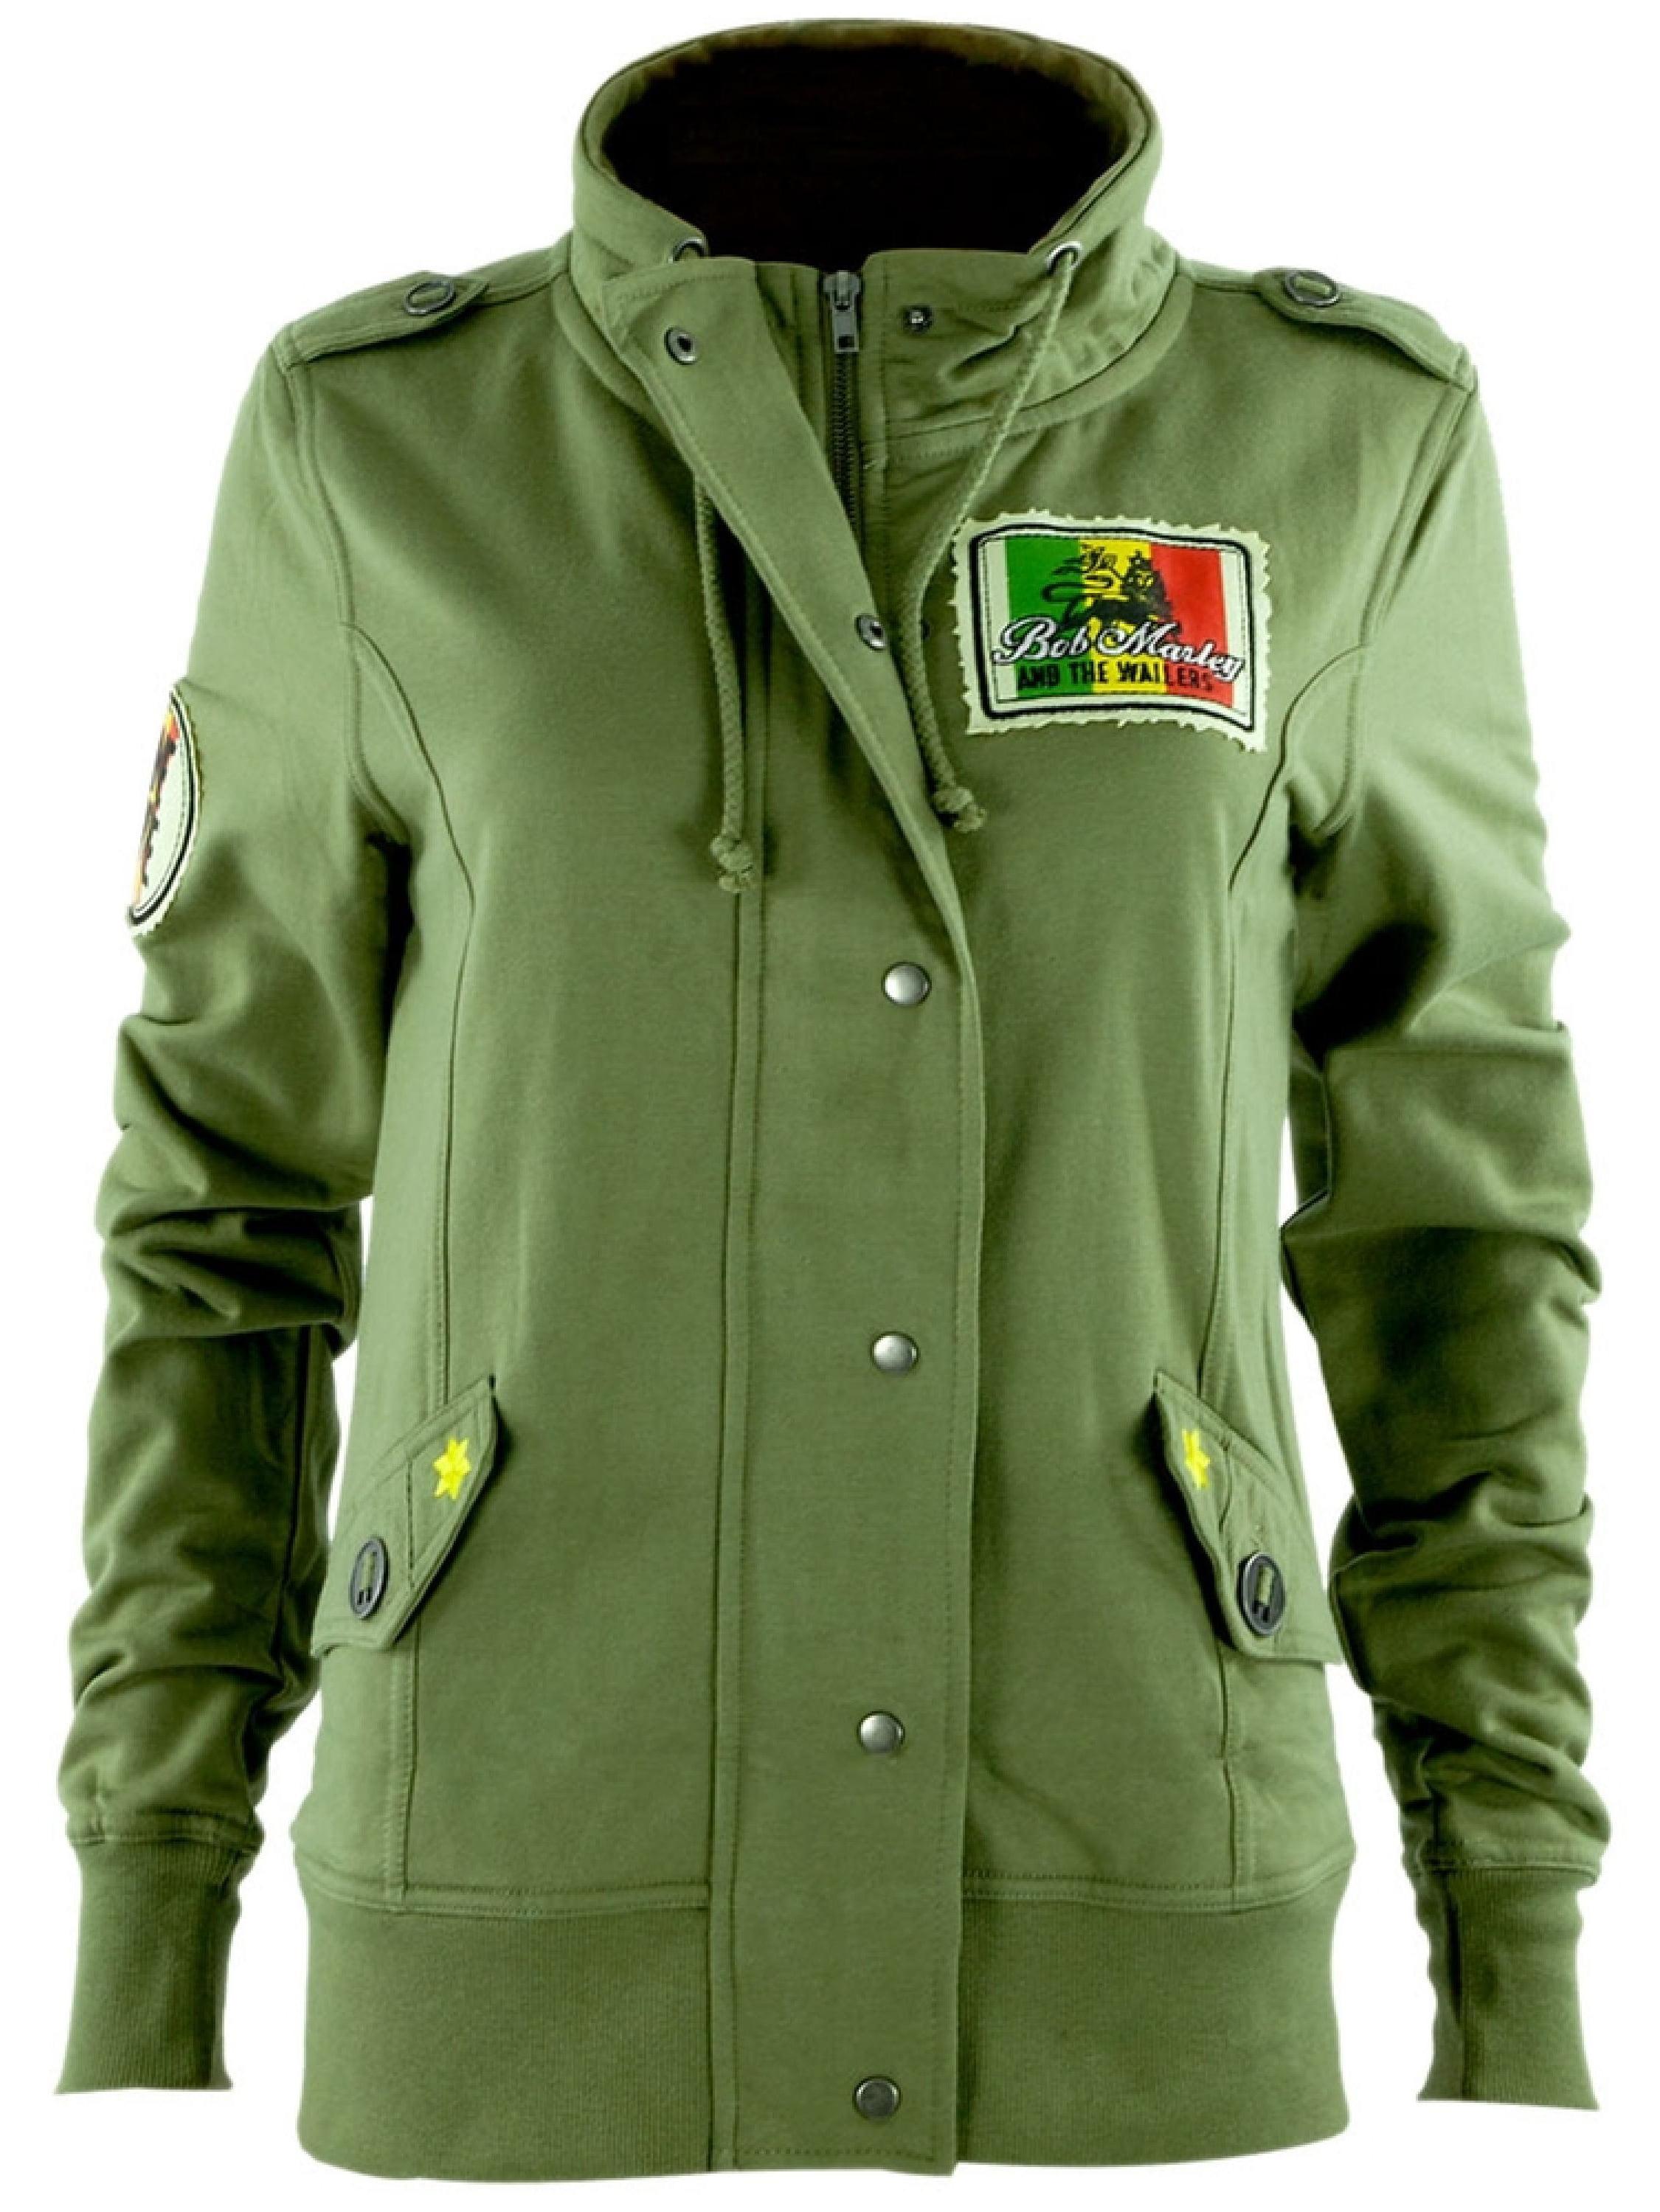 Military Juniors Jacket